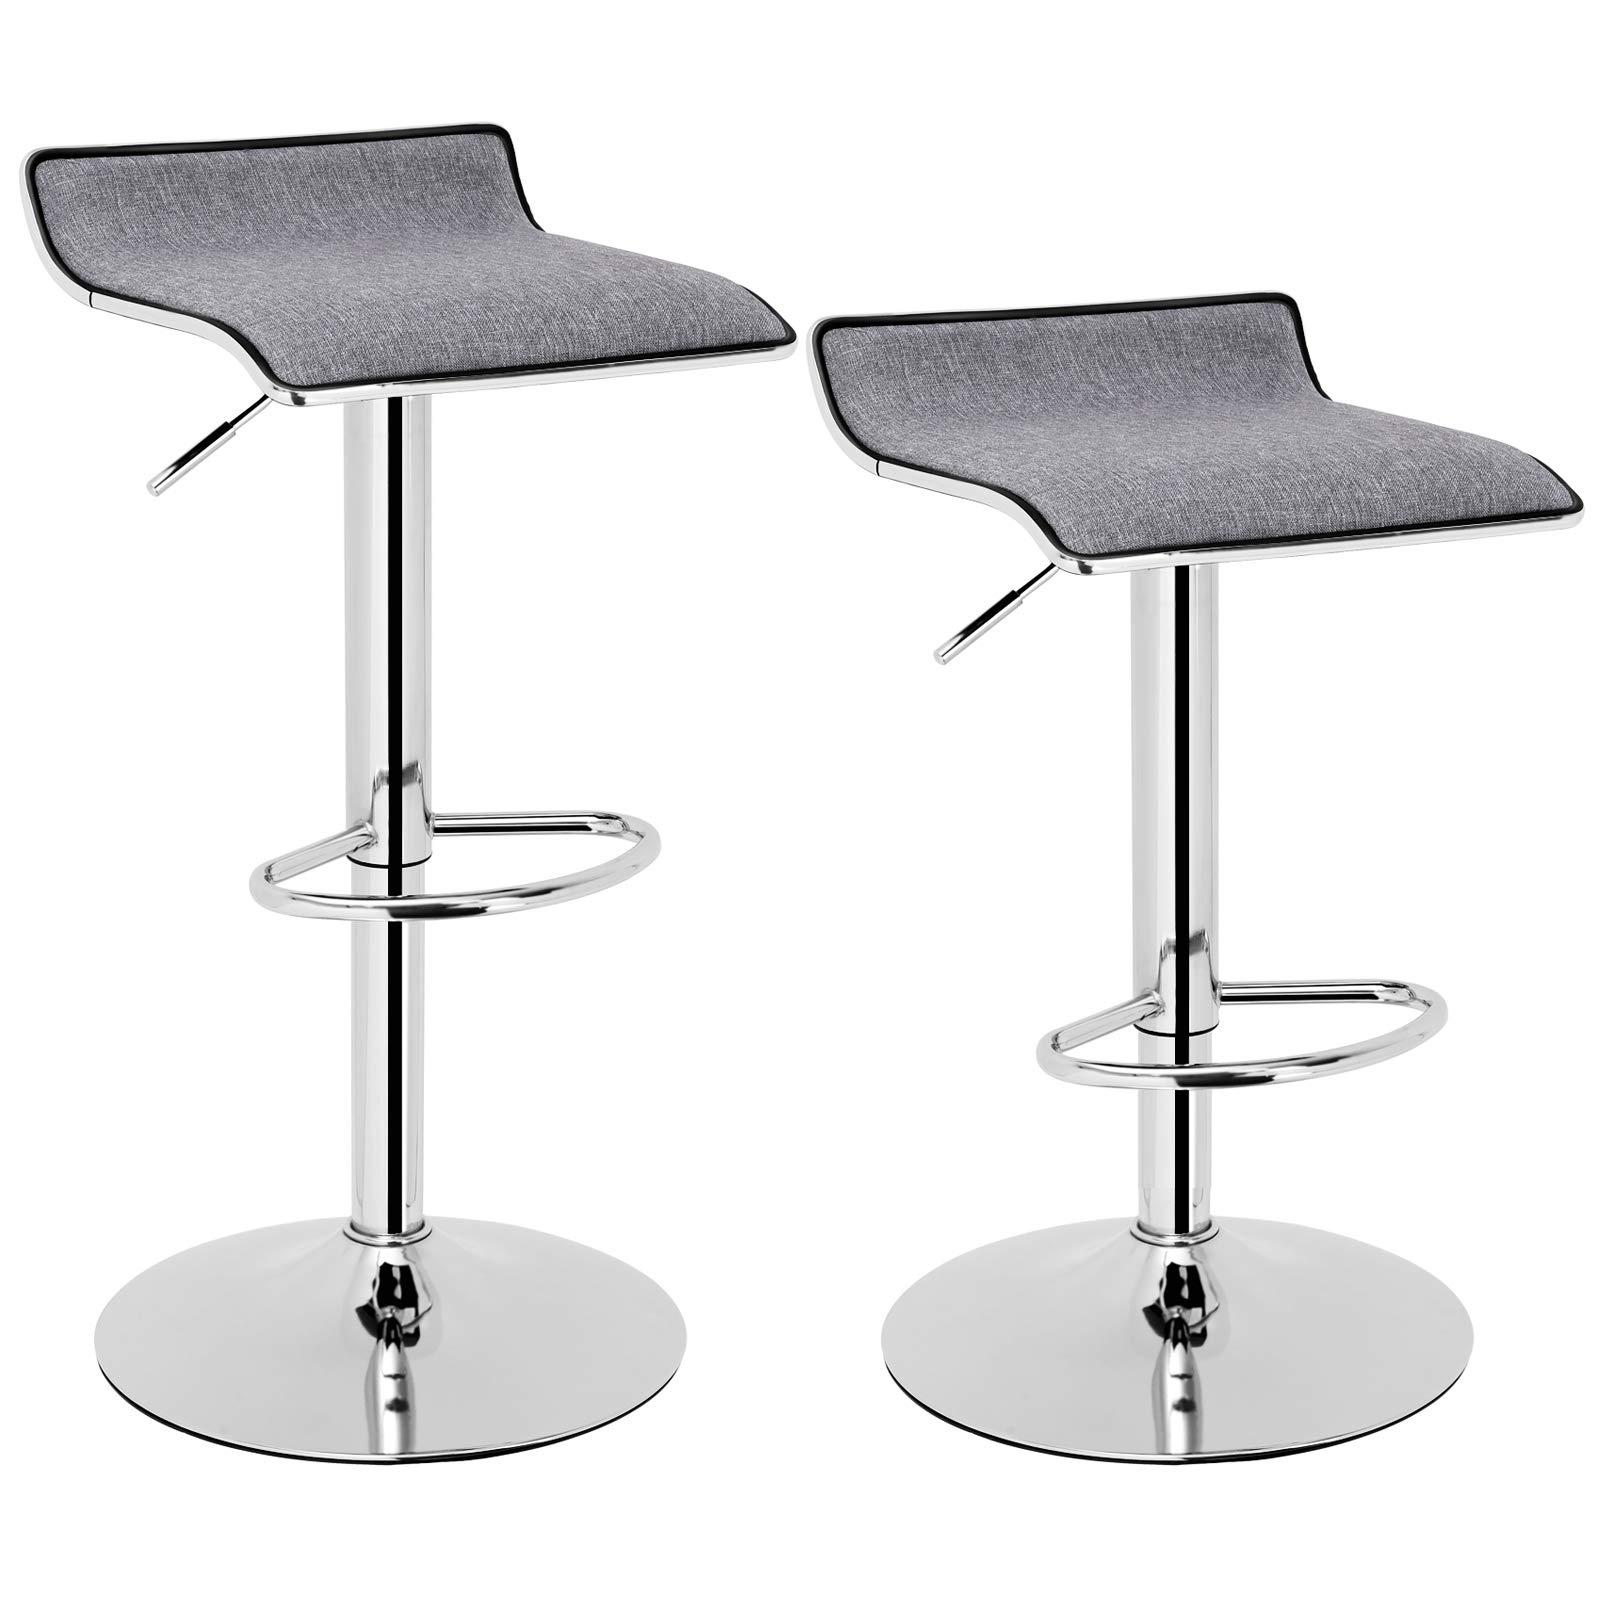 SONGMICS Set of 2 Adjustable Bar Swivel Kitchen Breakfast Counter Stools, with Linen Fabric Seat, Gray